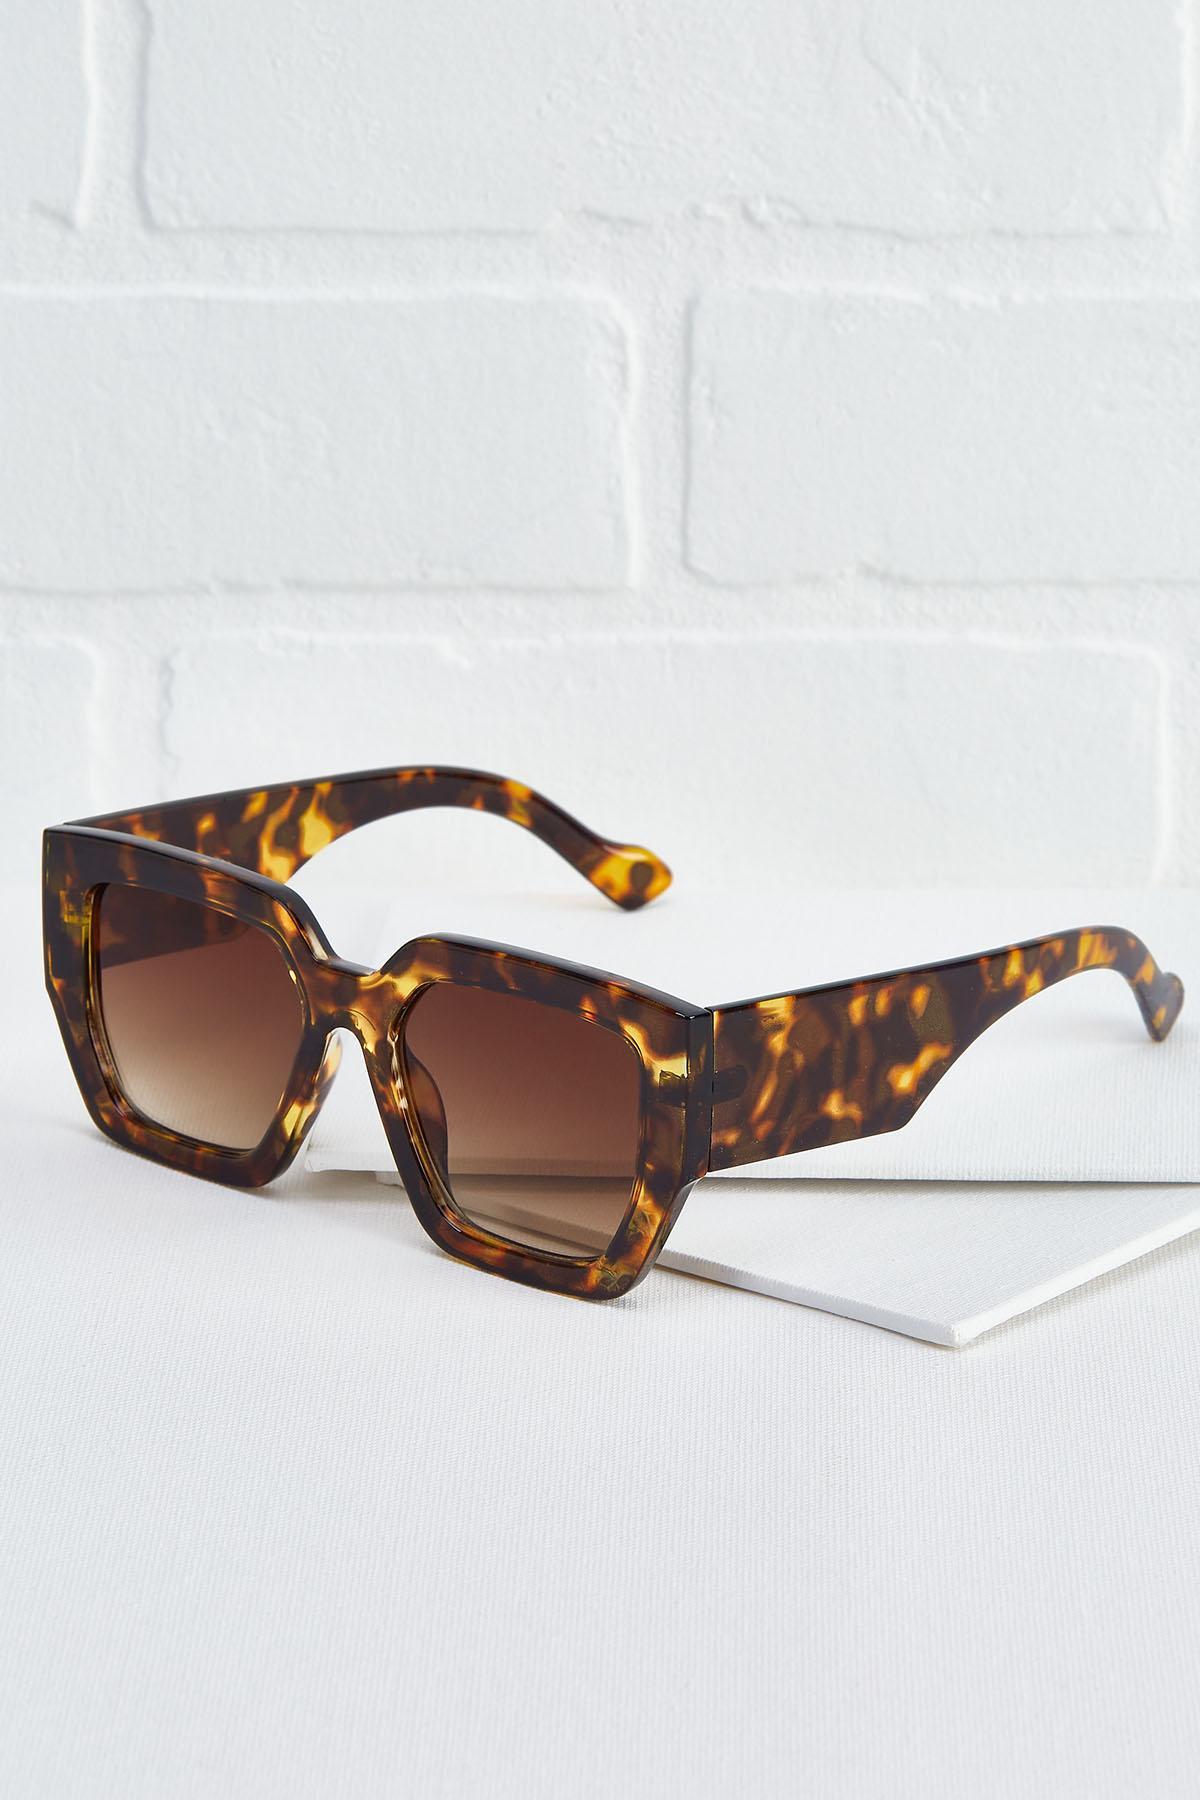 Celeb Status Sunglasses